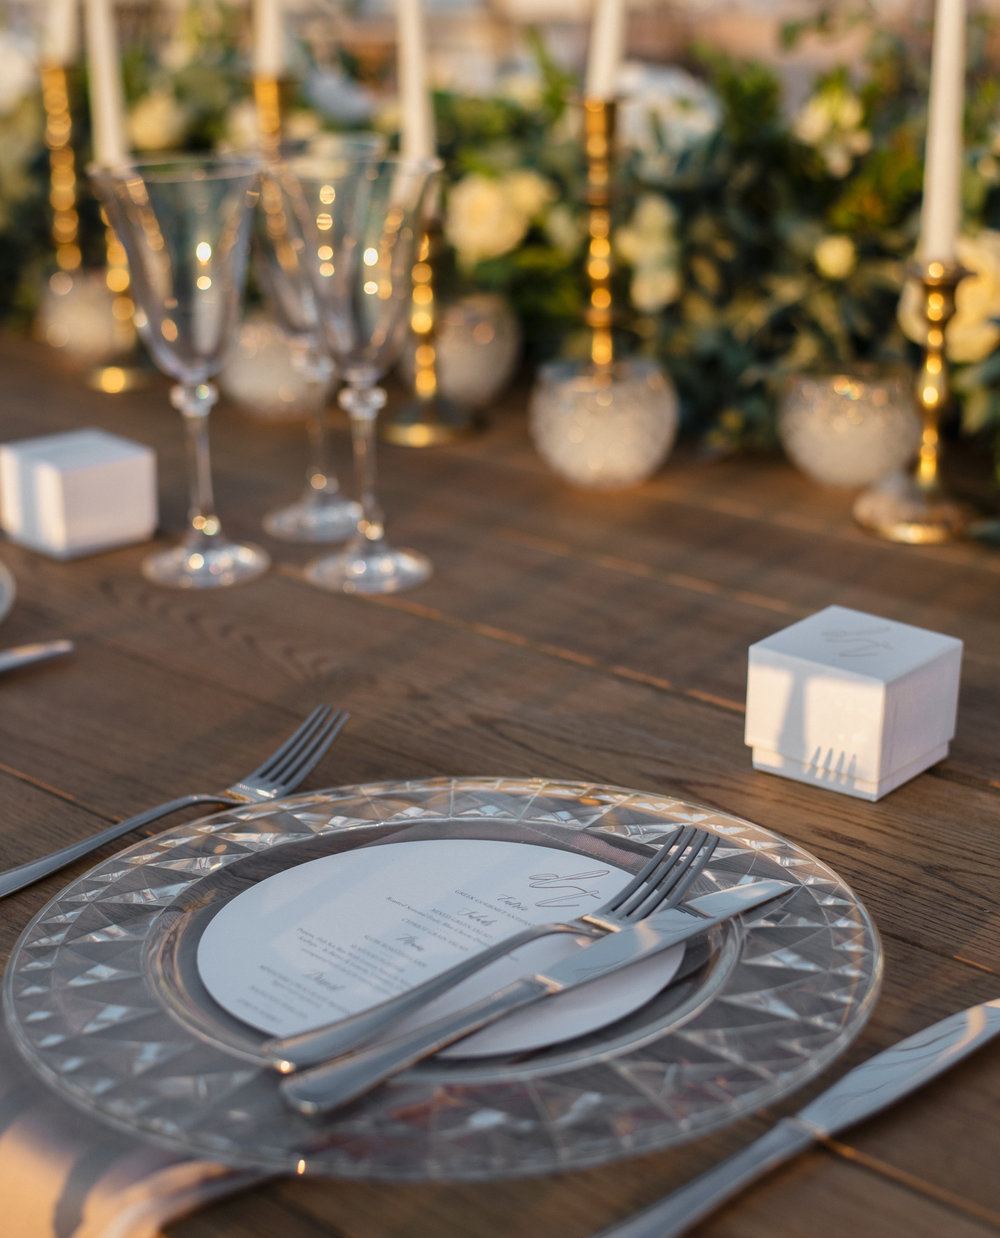 santorini-island-greece-wedding-dinner-celebration-ceremony-groom-brid-sunset-wedding-table-crystal-charger-plate-arrangement-rocabella-hotel-silkentile-event-planning-firm